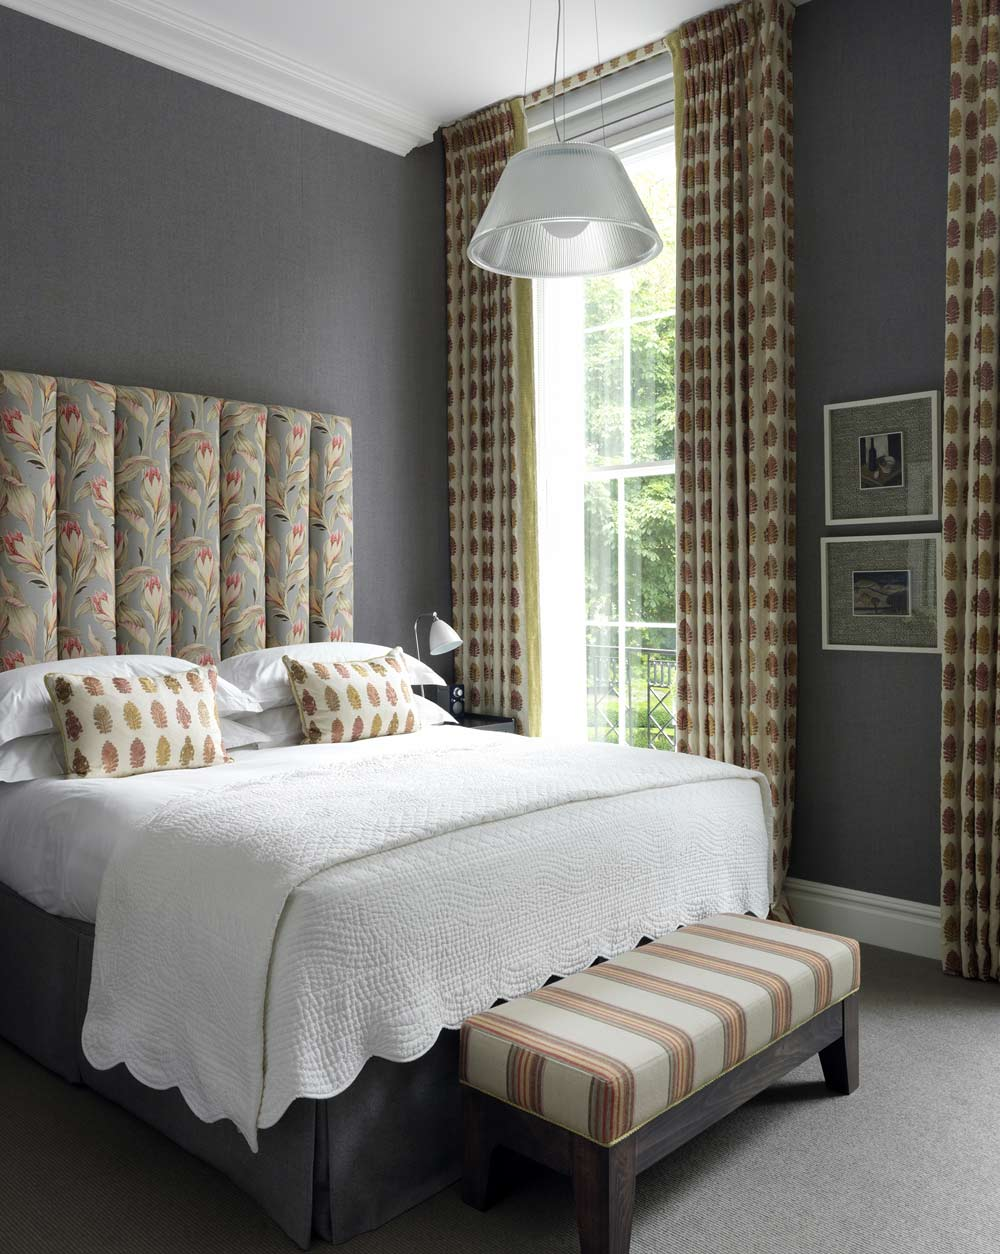 Guest room at Dorset Square HotelLondonUnited Kingdom